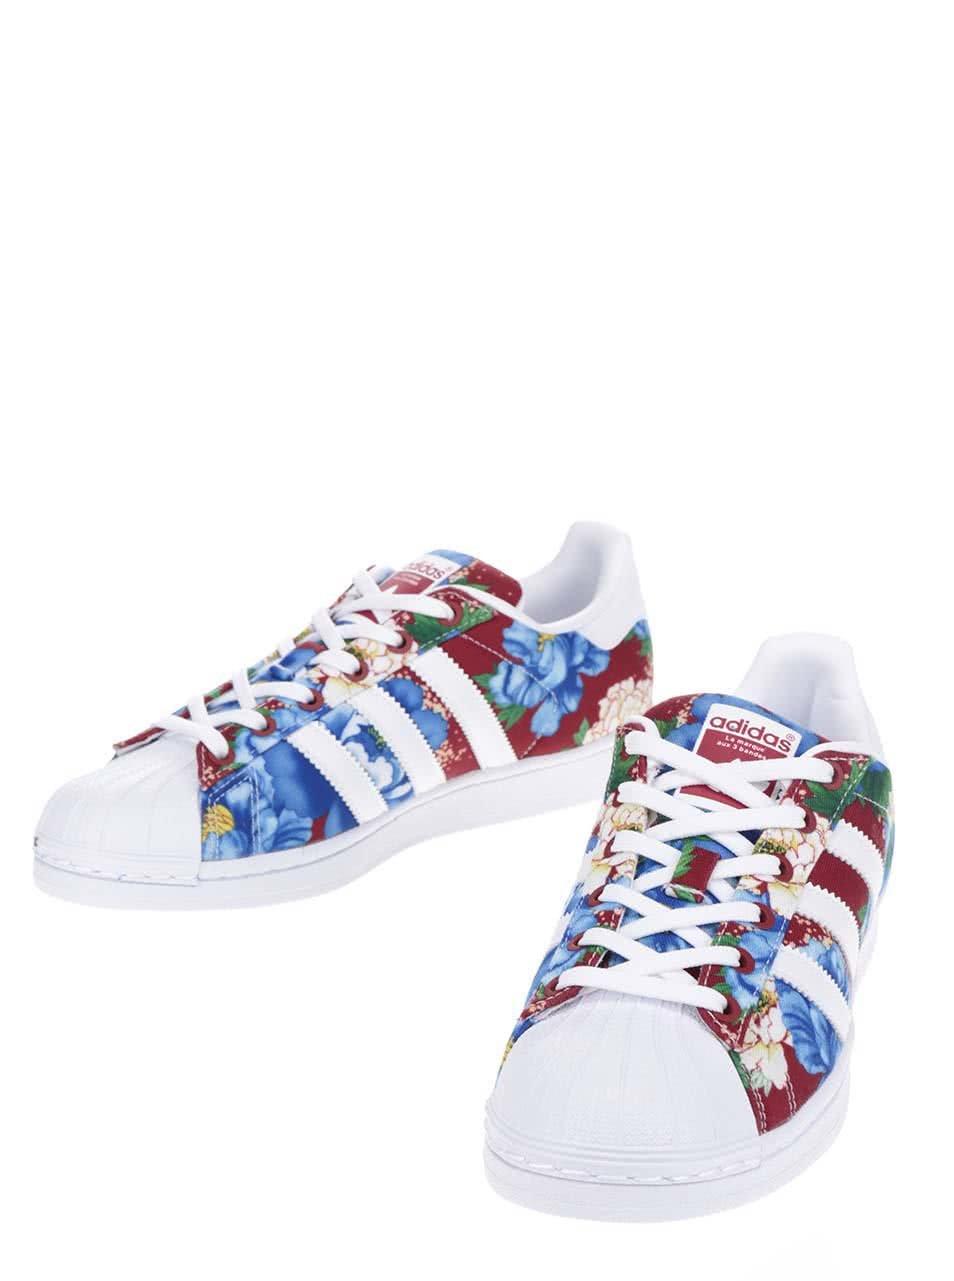 9287b70d887 Bílo-červené dámské květované tenisky adidas Originals Superstar ...